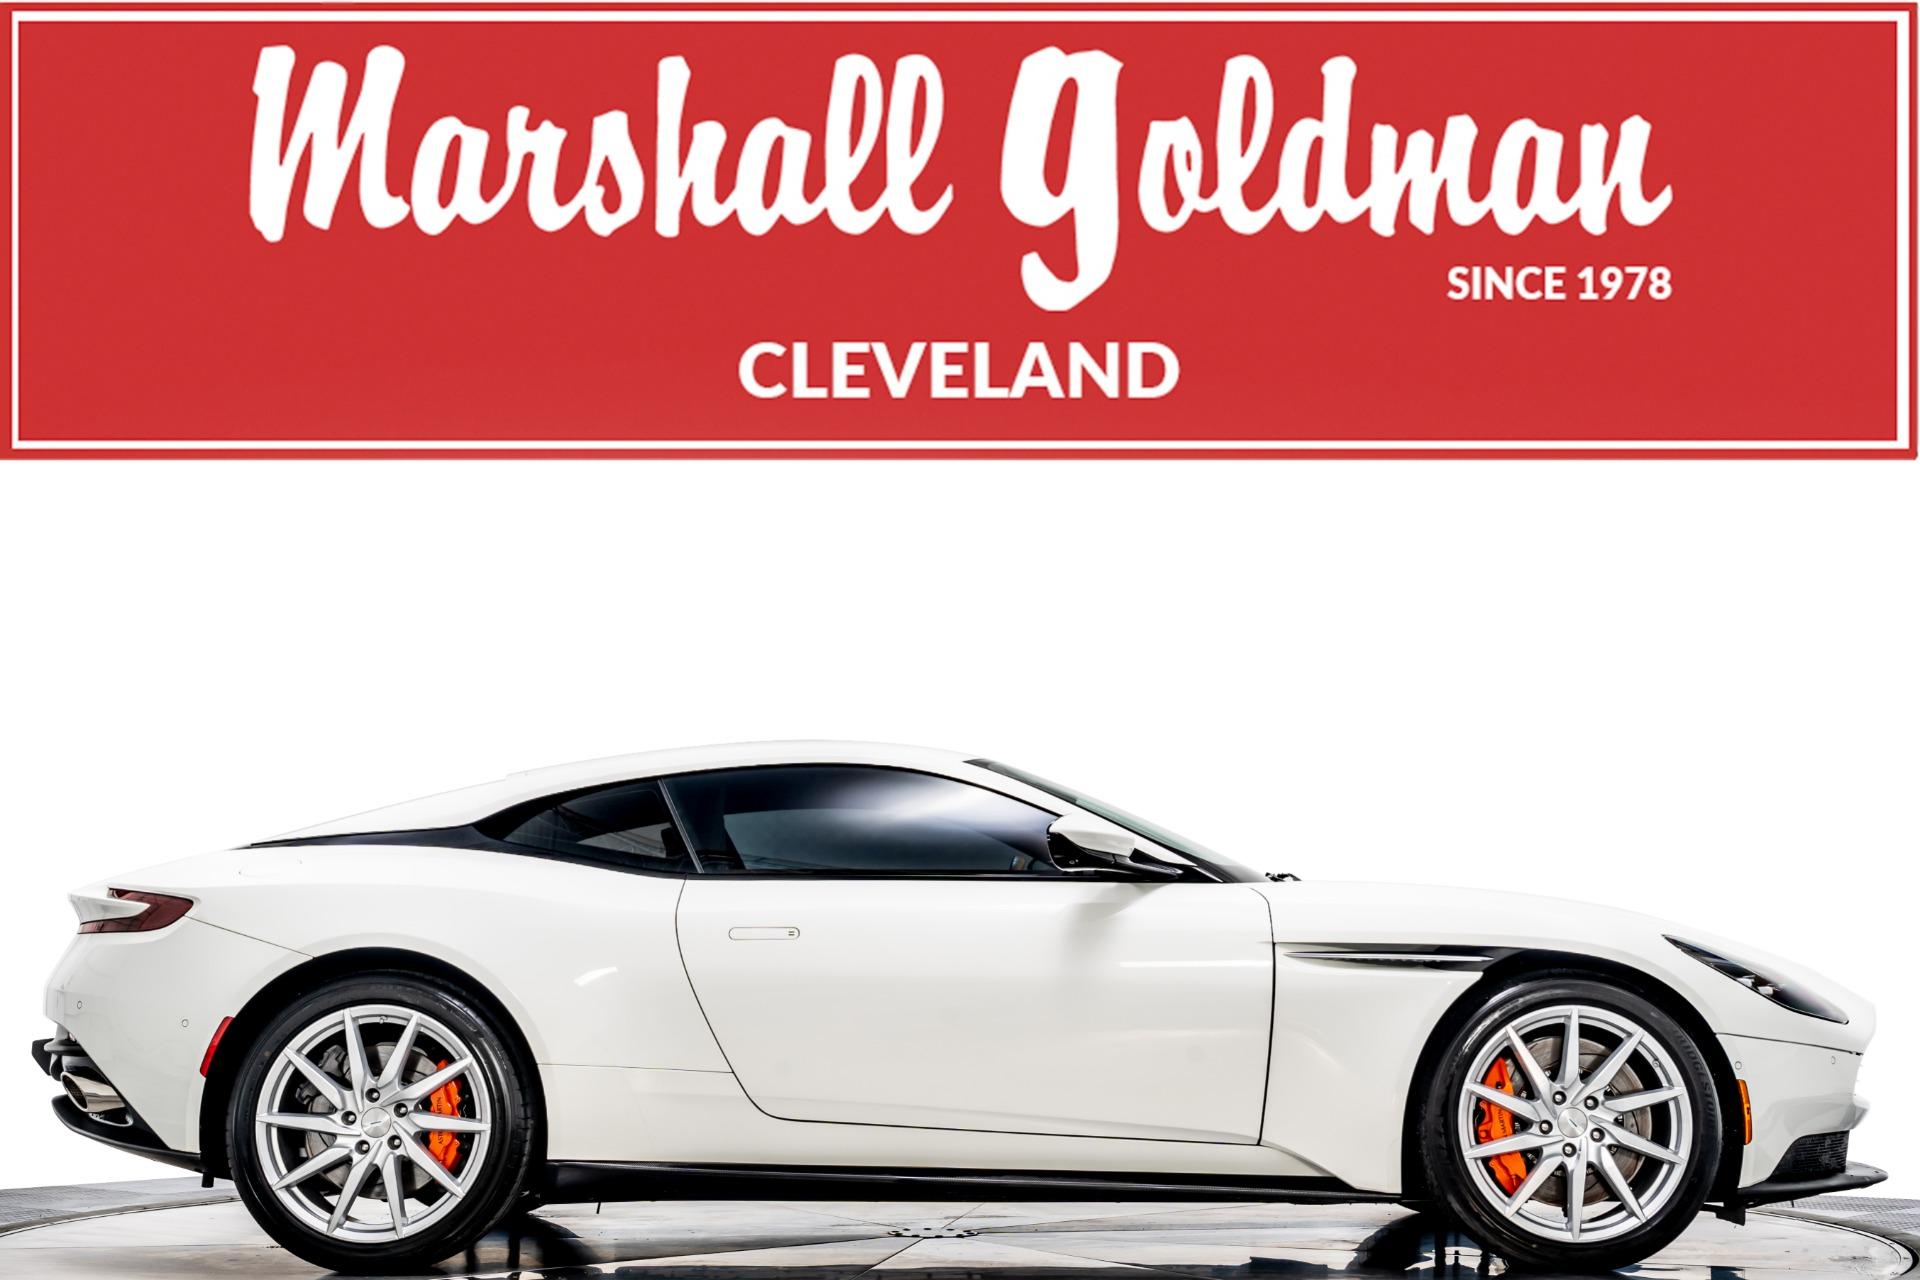 Used 2018 Aston Martin Db11 V8 For Sale Sold Marshall Goldman Cleveland Stock W20932